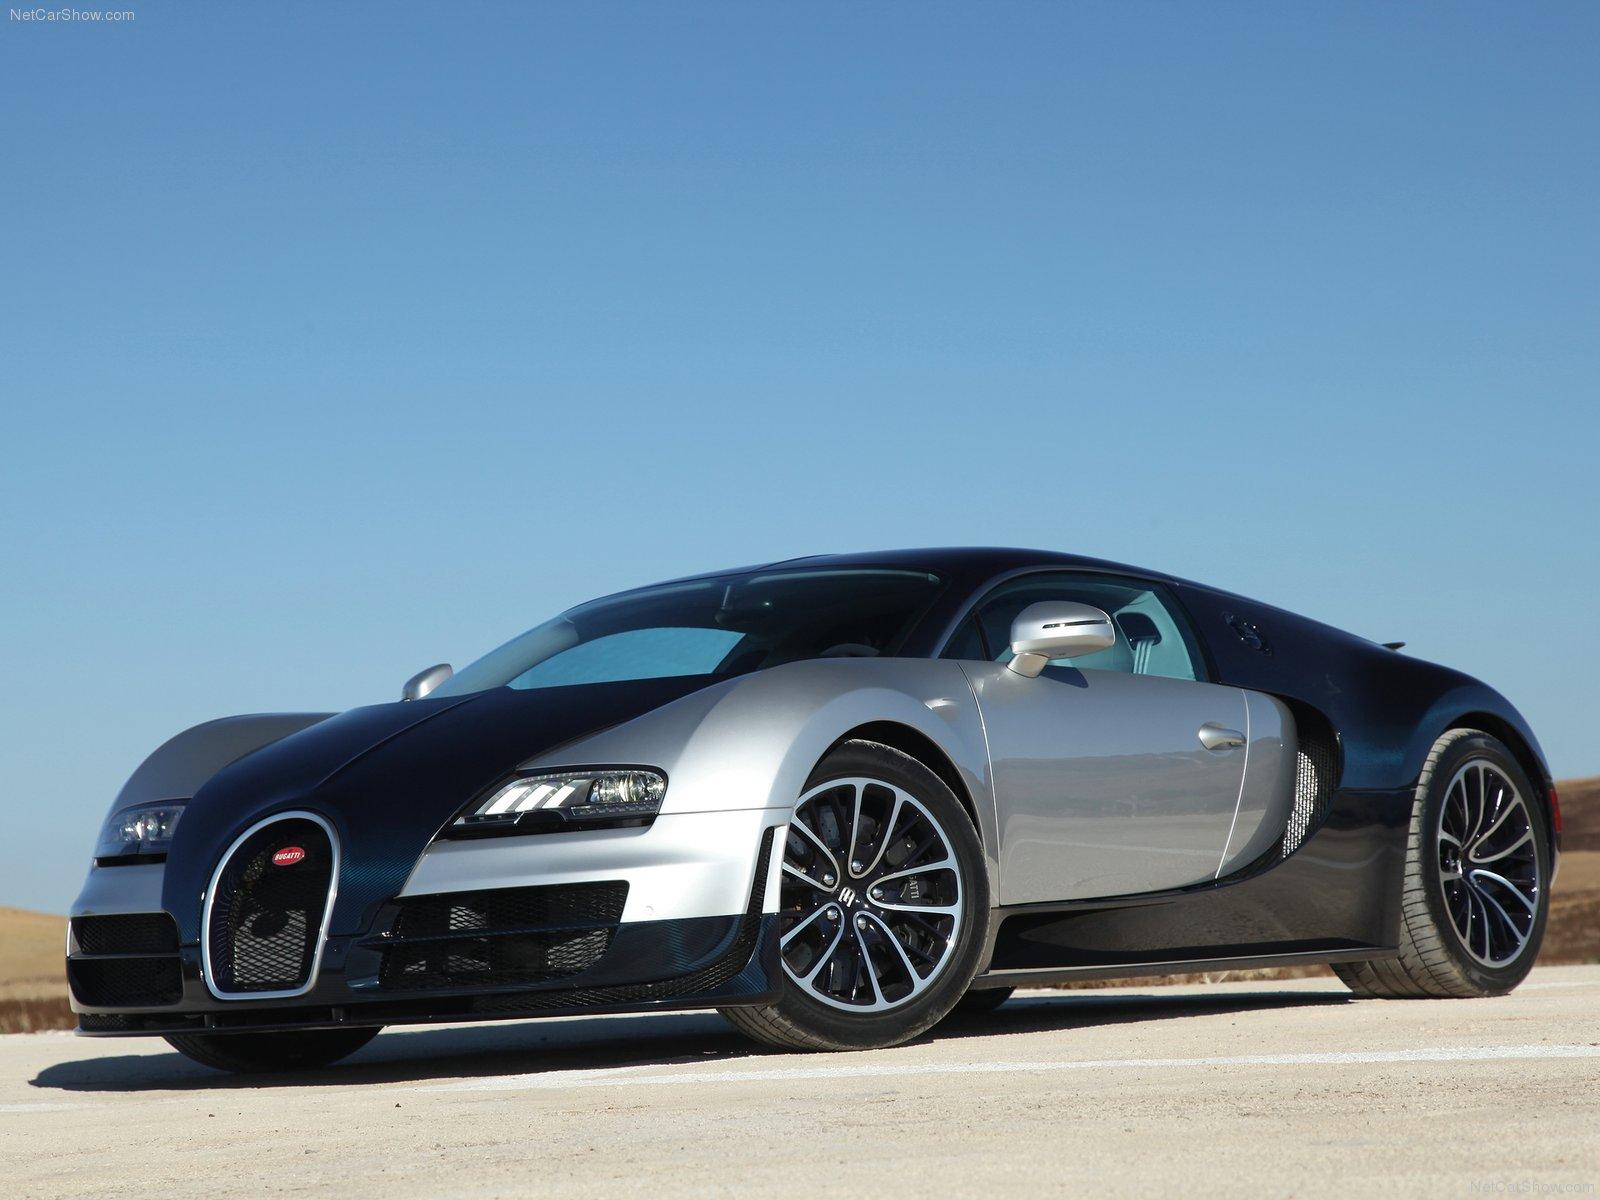 Bugatti Veyron Super Sport Photos Photogallery With 55 Pics